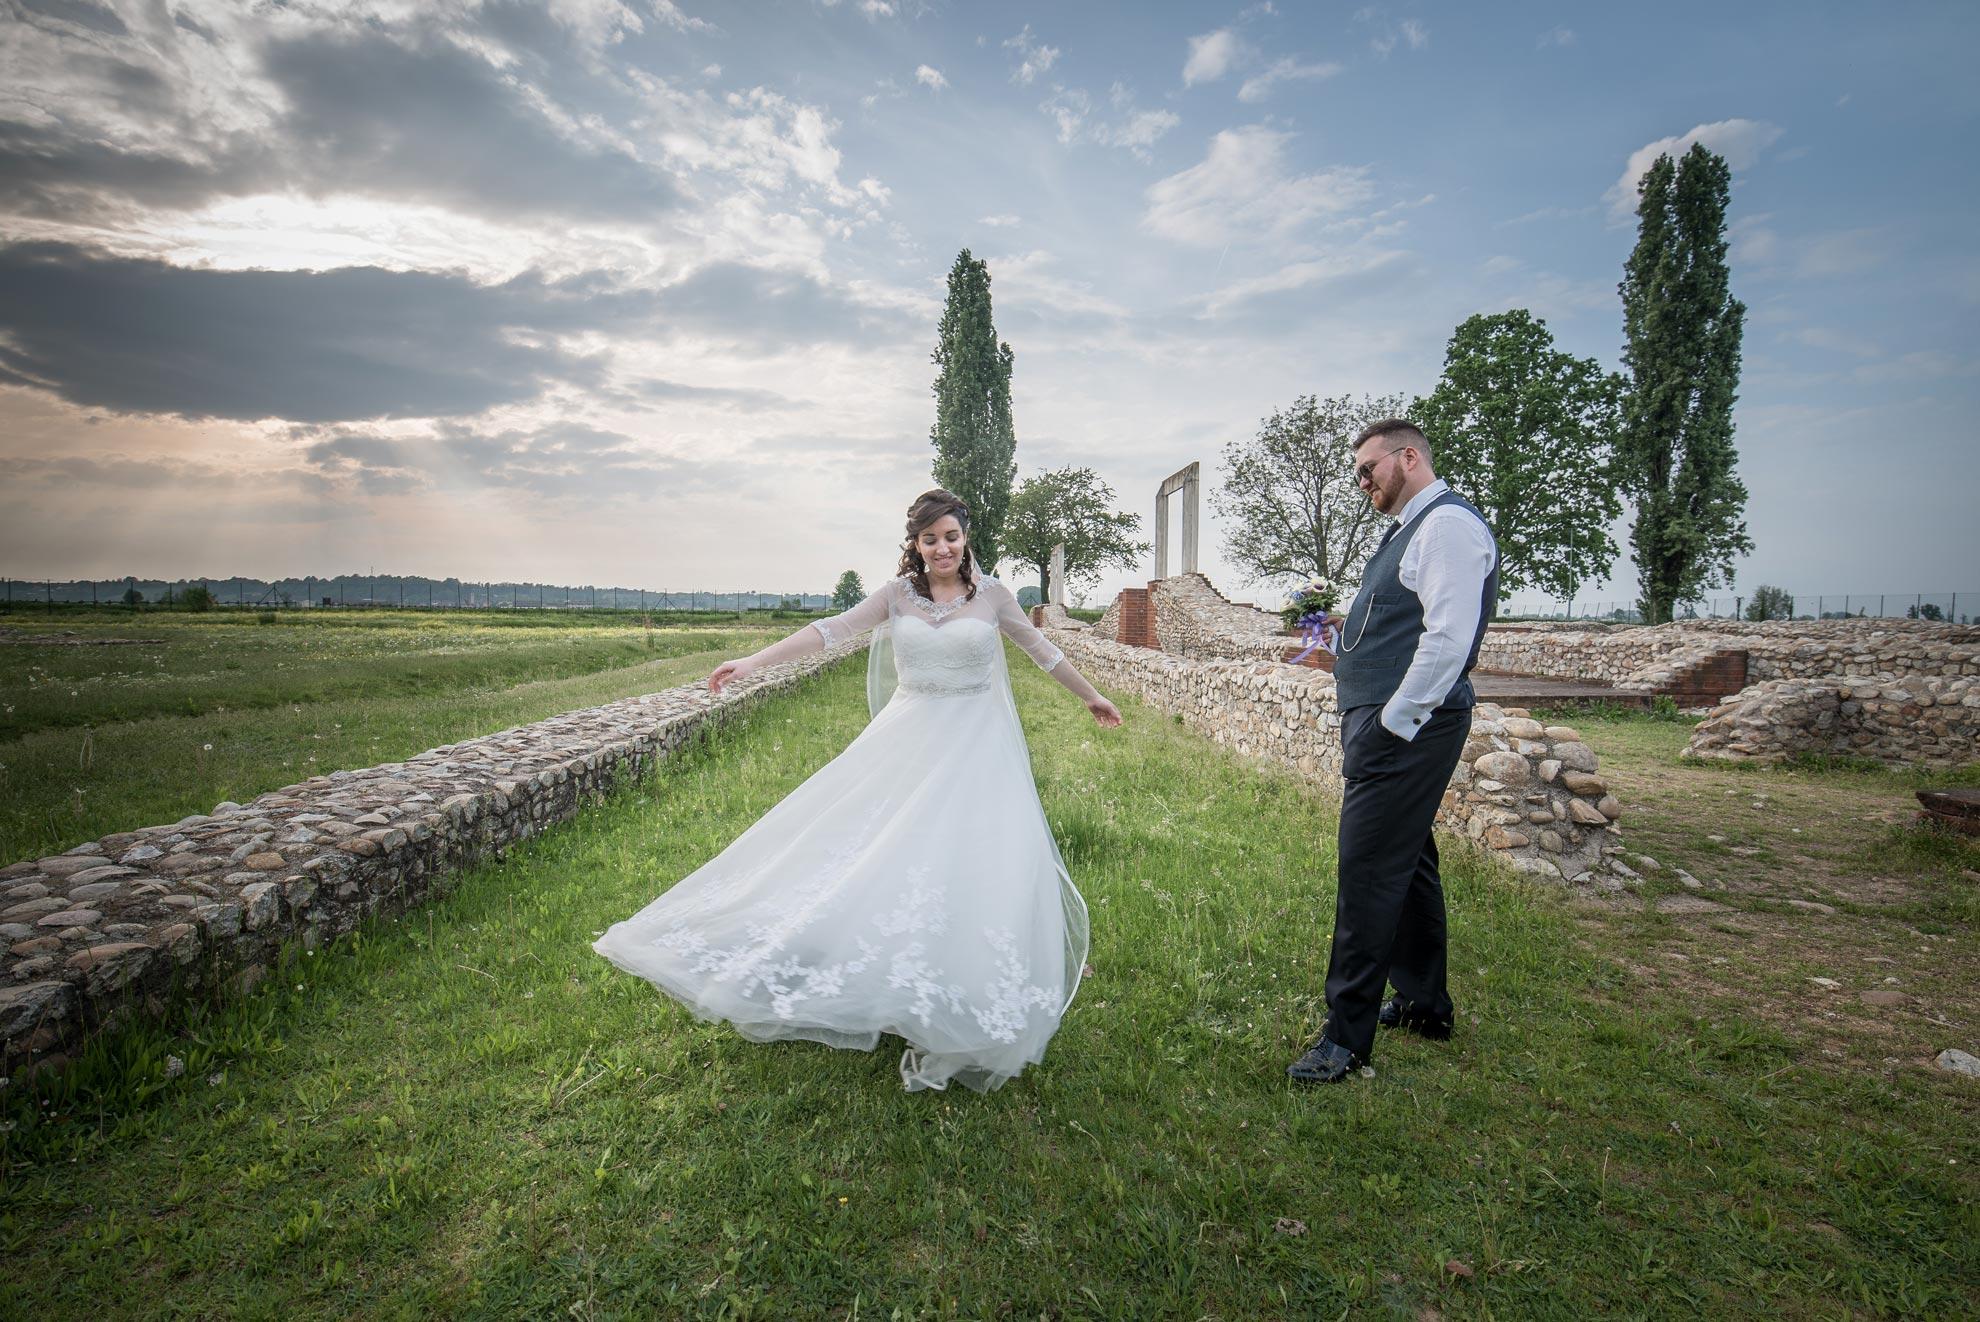 Matrimonio a Narzole Lorenza Diego - DSC 0726 - Fotografo Matrimonio nel Roero - Fotografo Matrimonio nel Roero